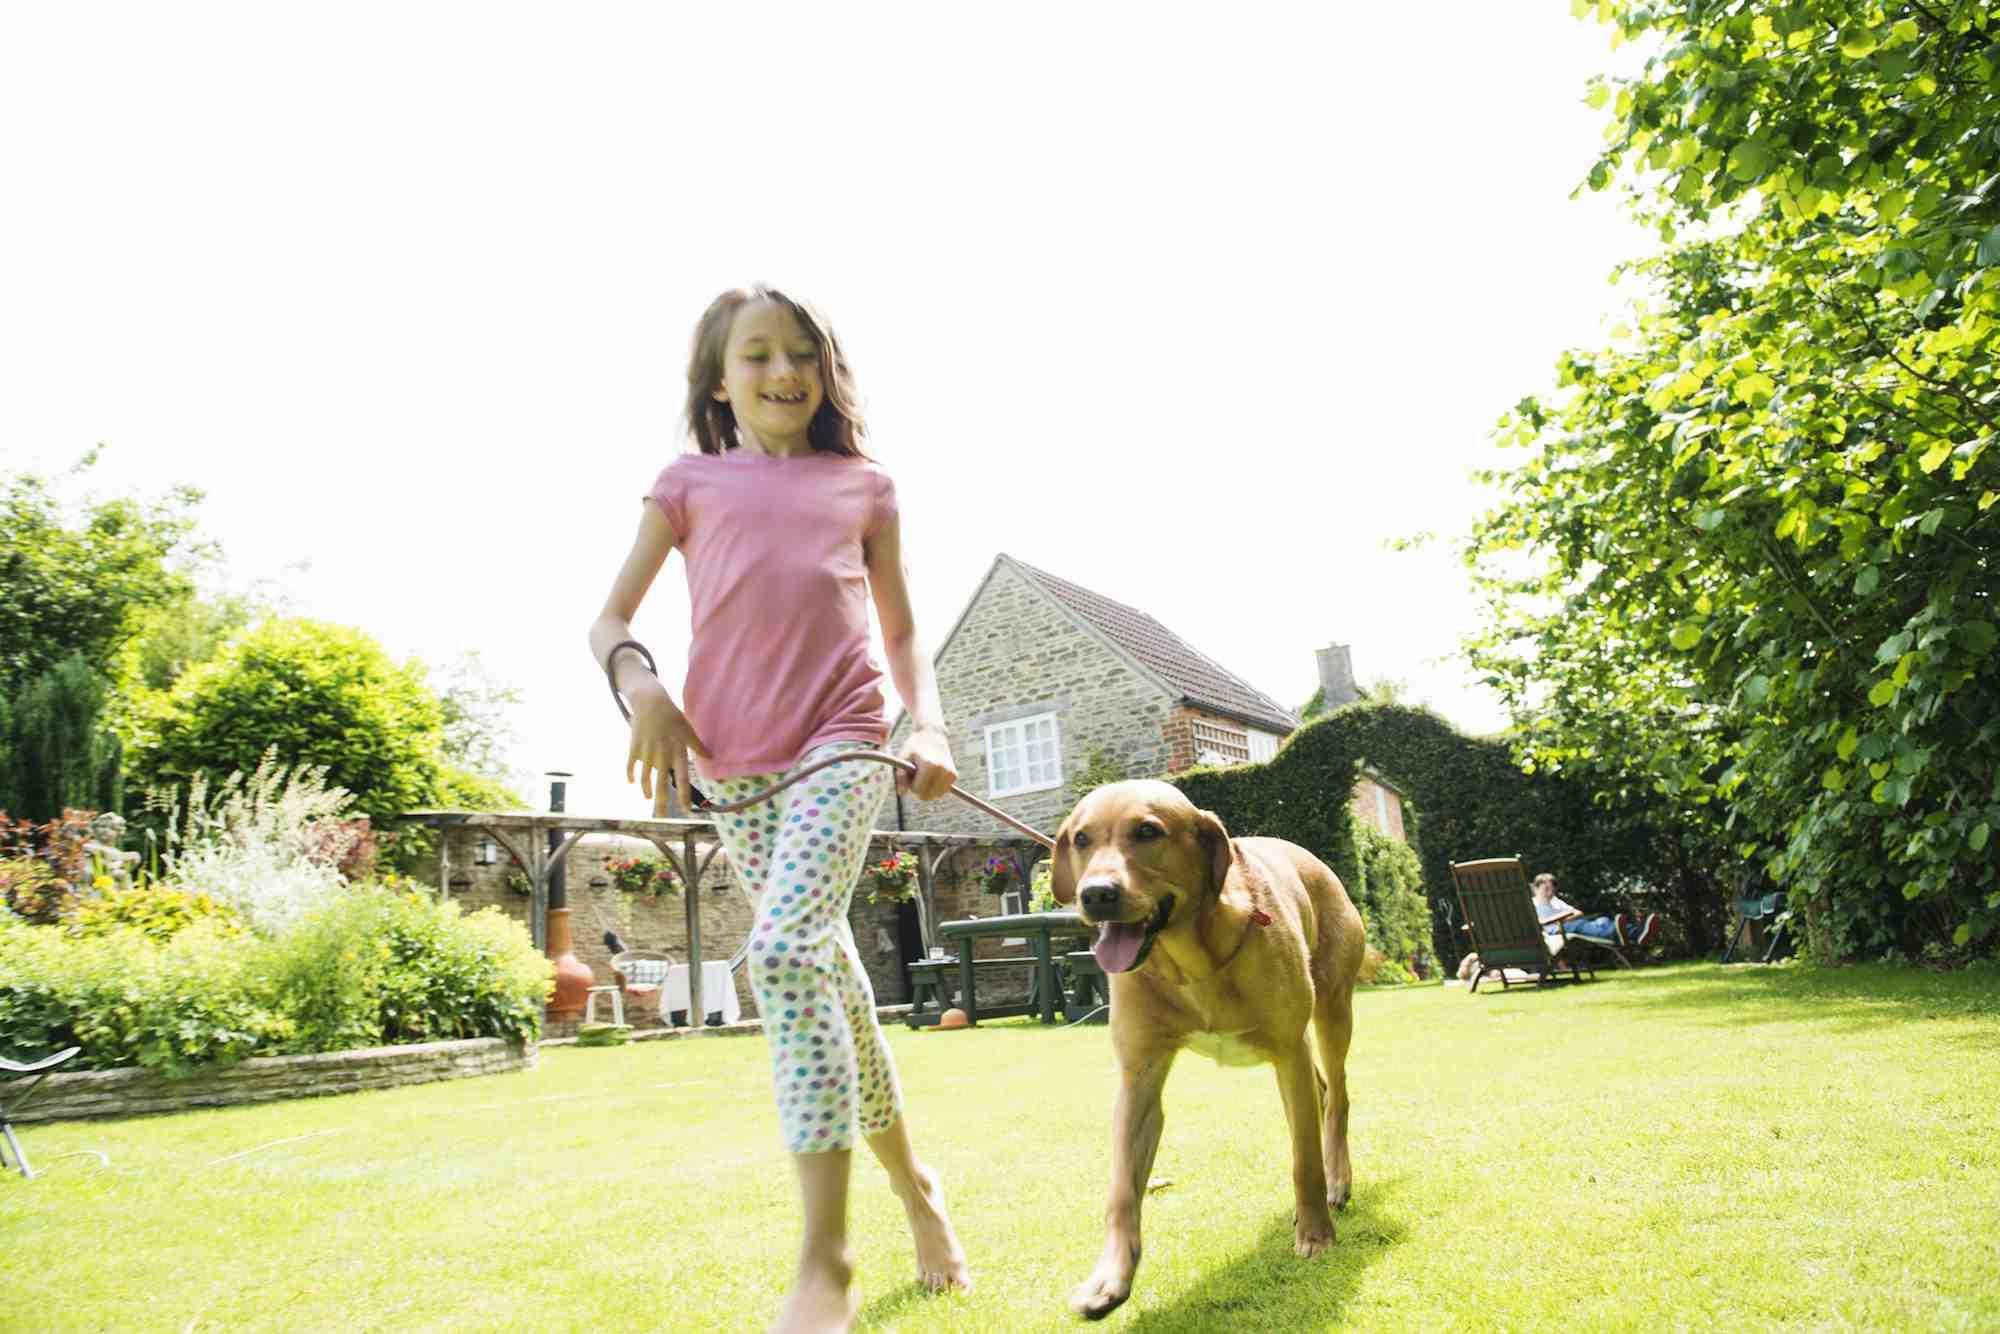 Girl walking do on leash in garden